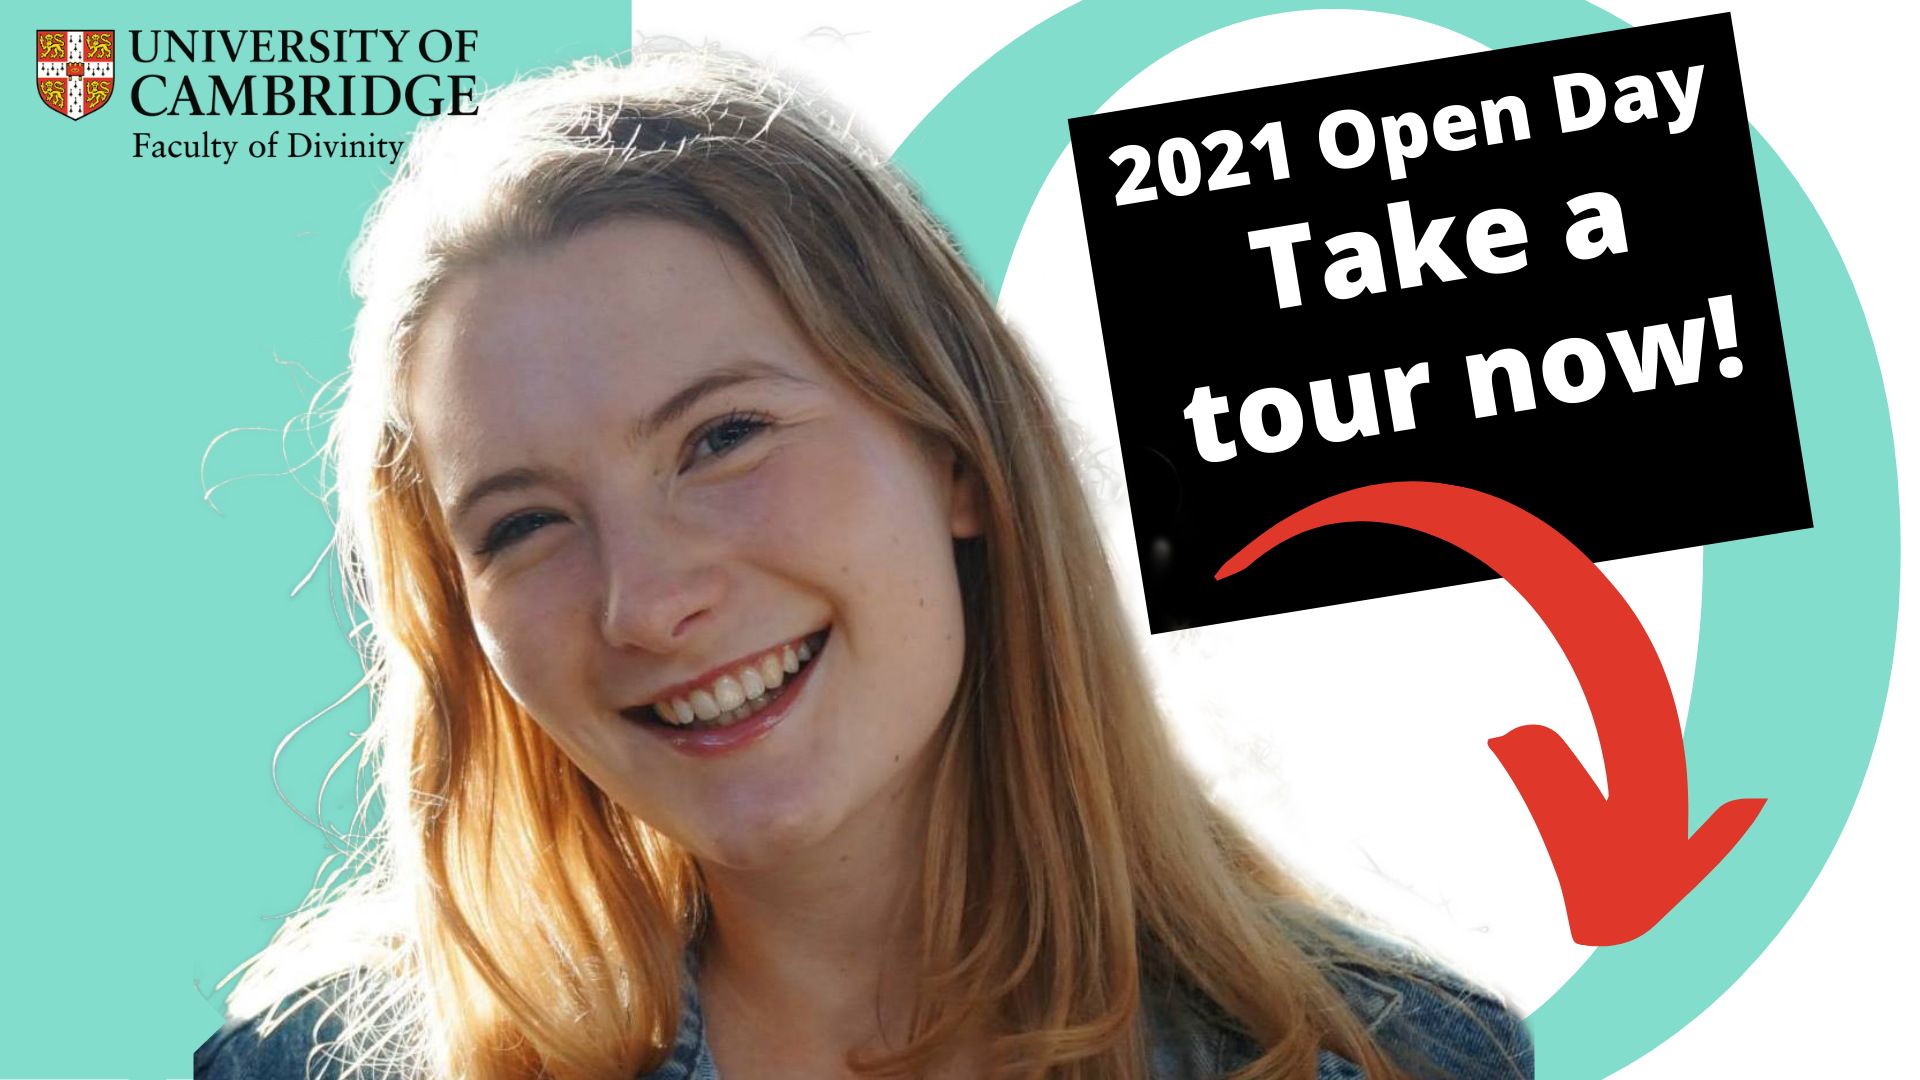 Take an Open Day tour